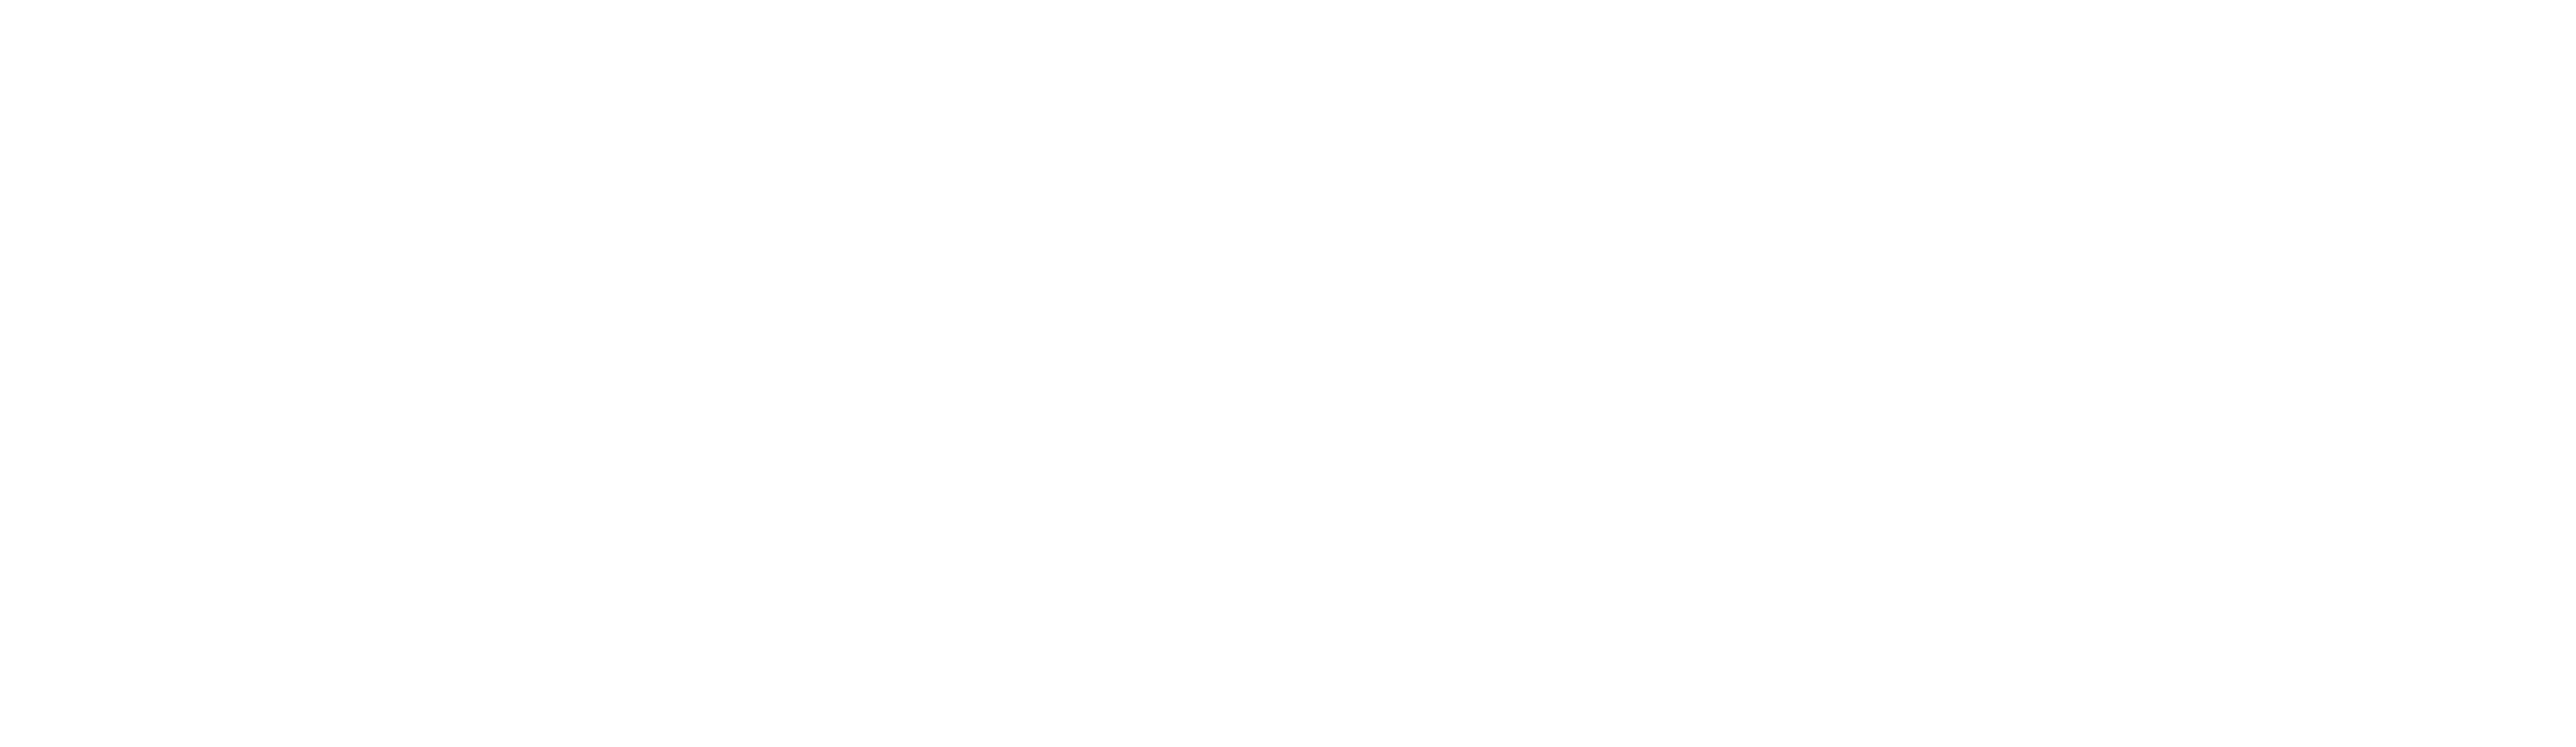 DanielFeldman-LPS-Logo-WH-HR